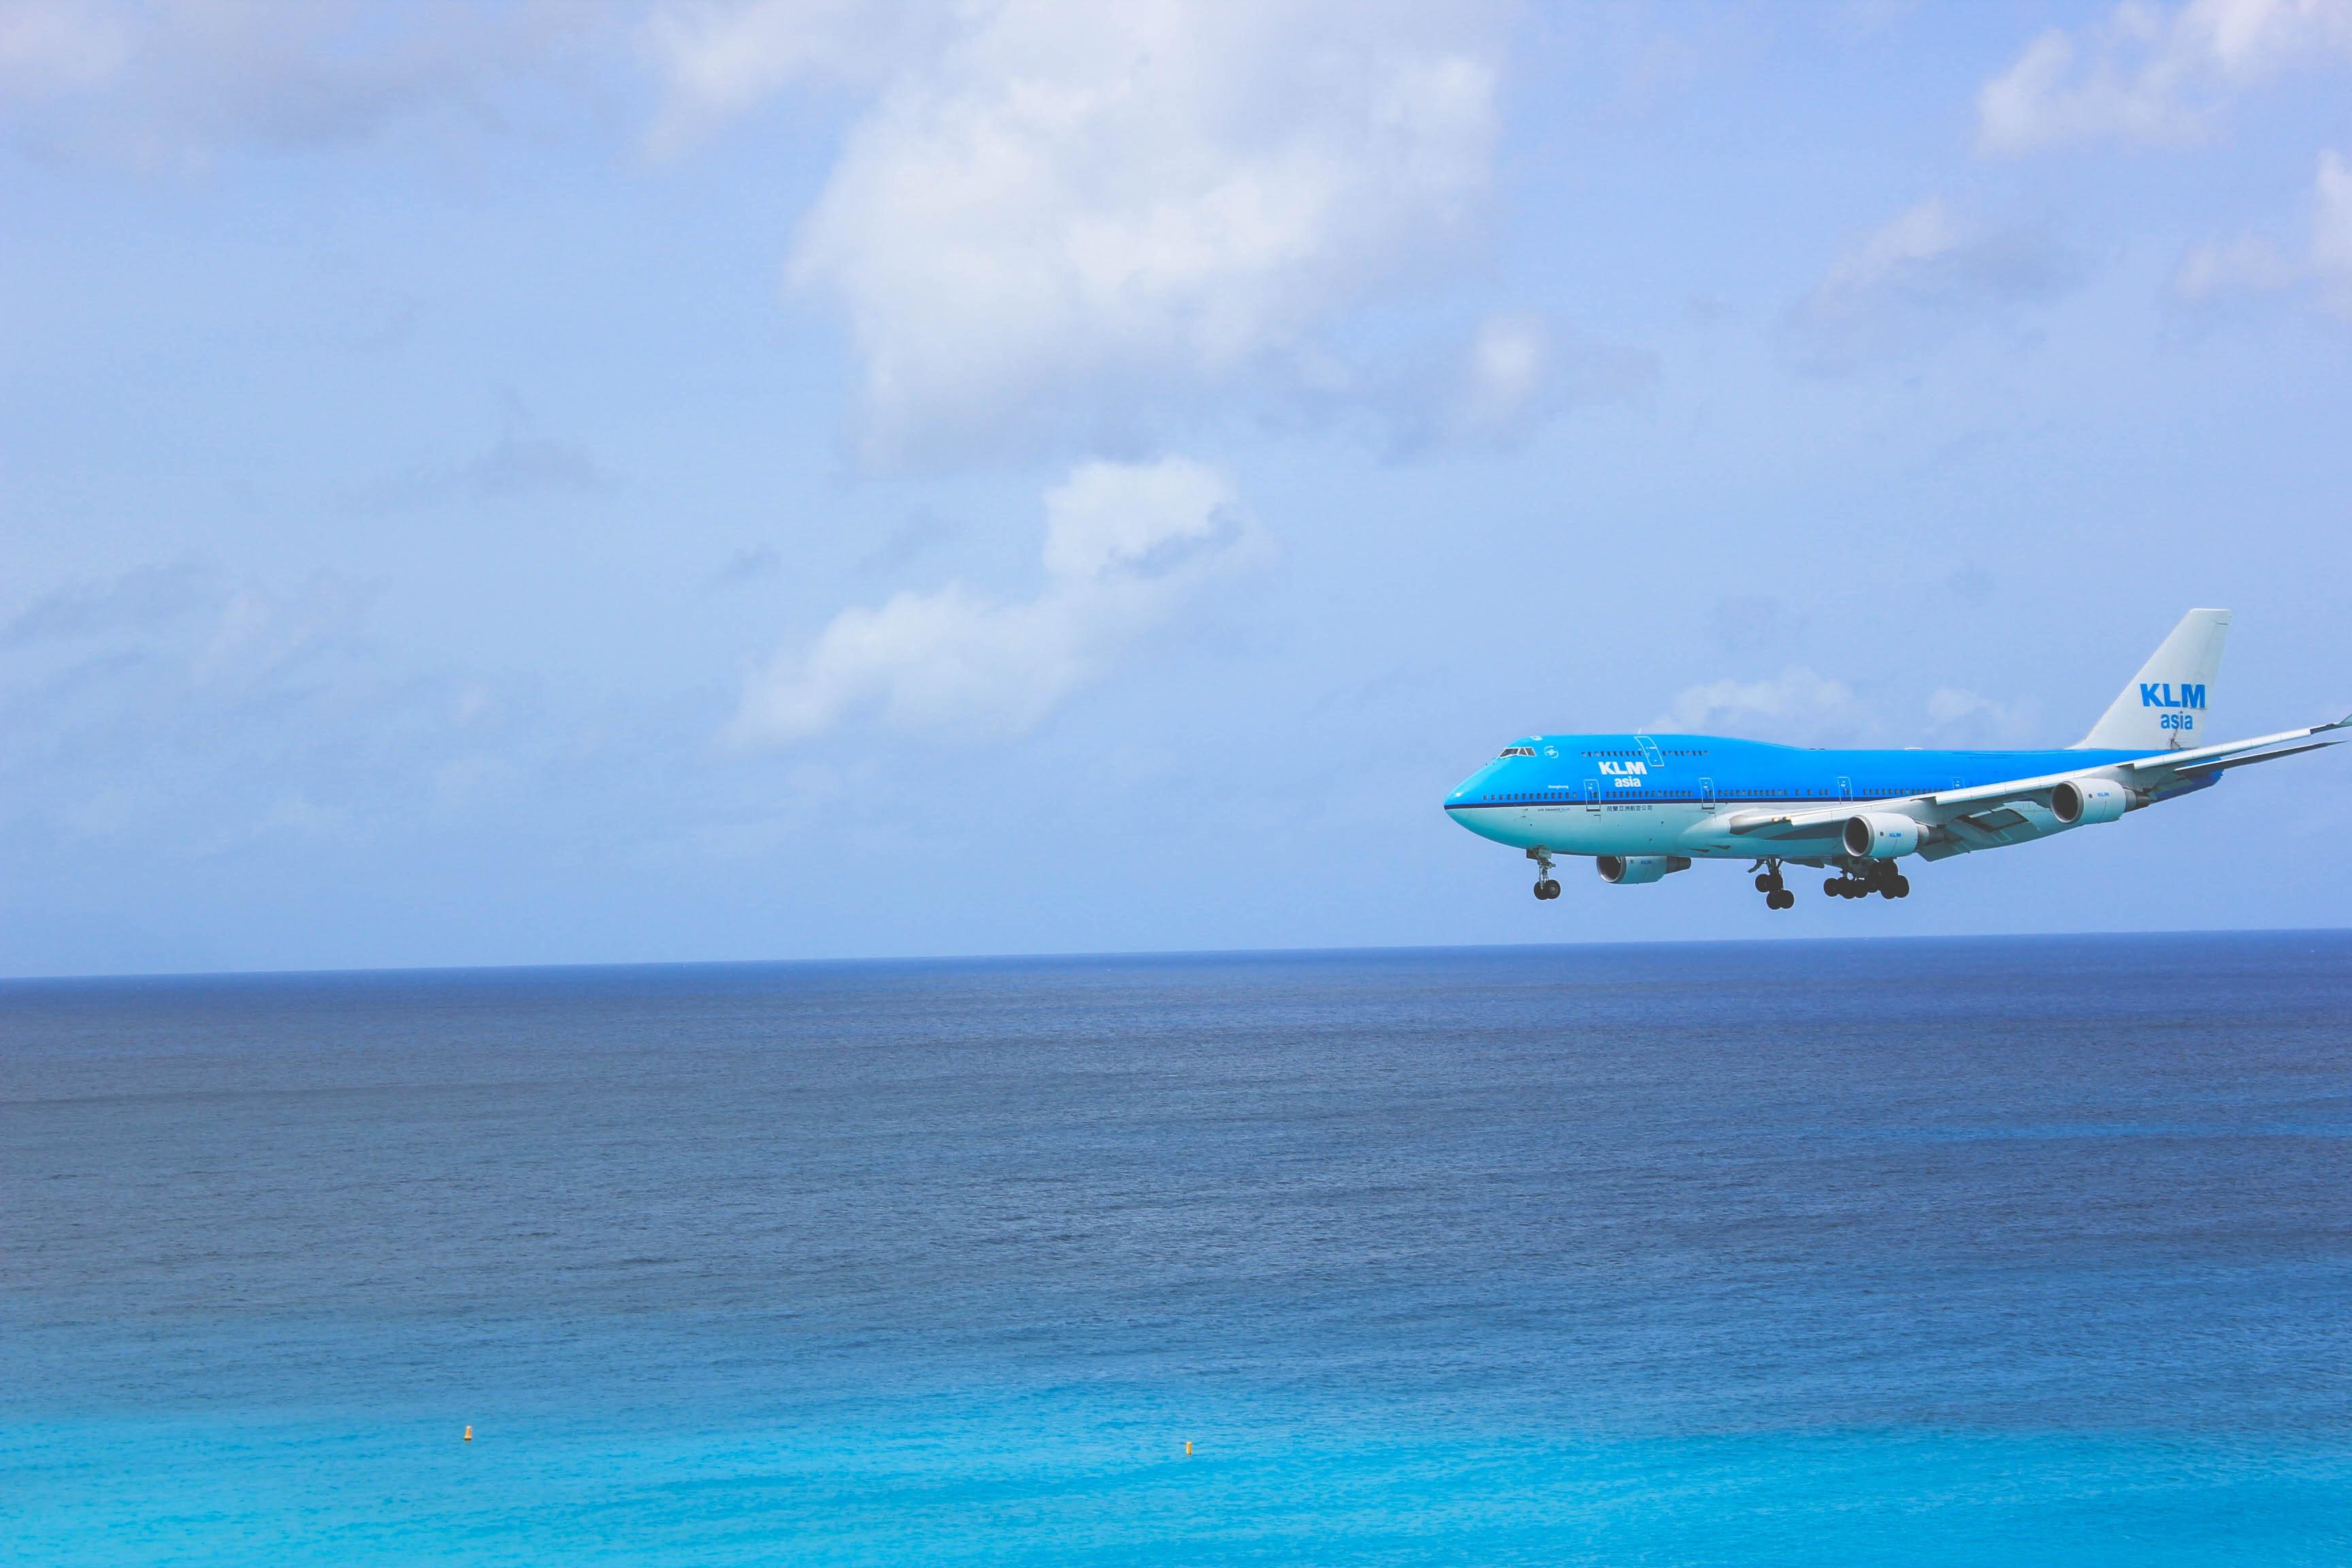 White and blue passenger plane photo